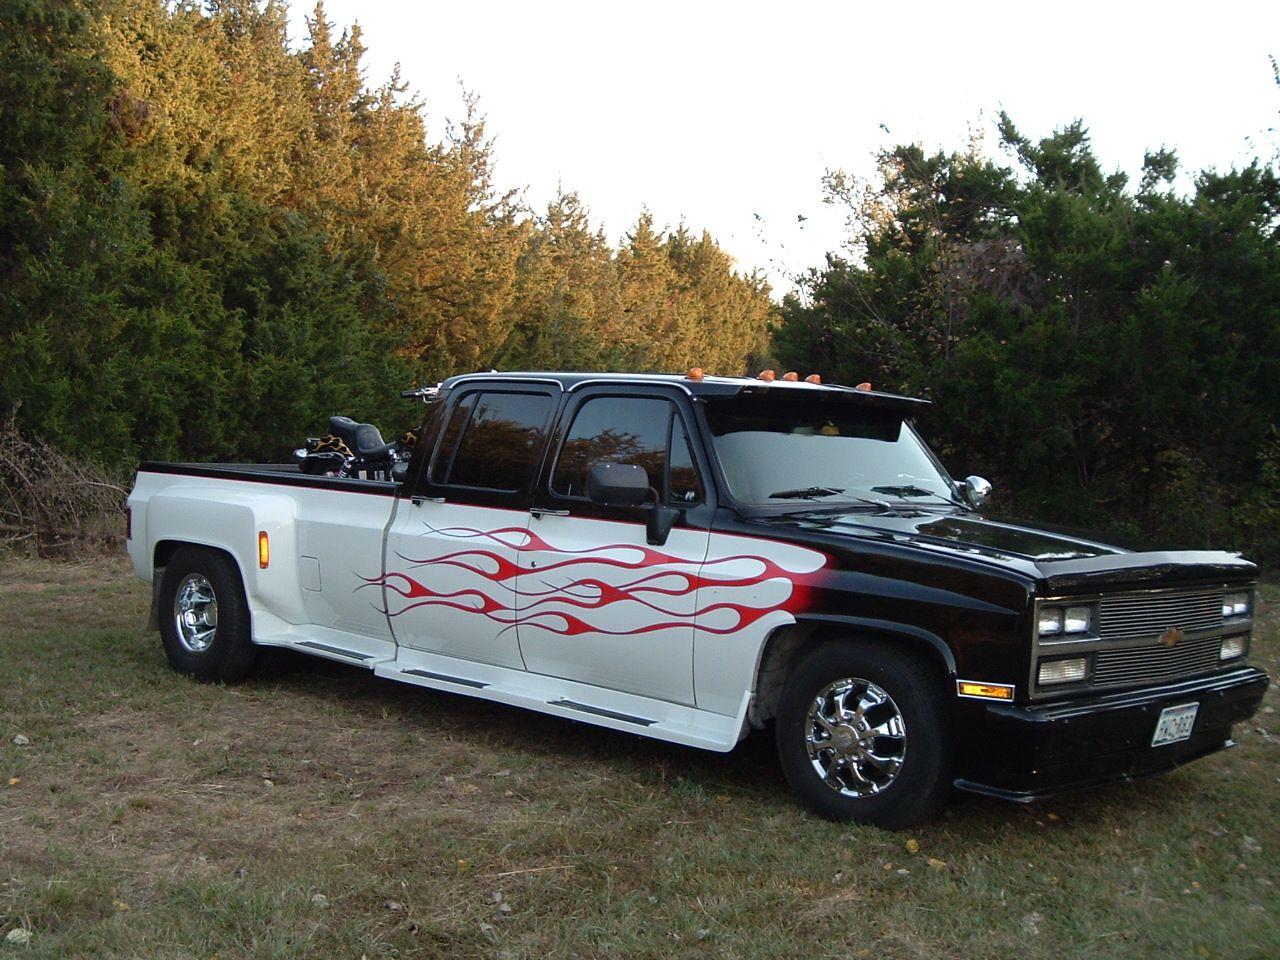 Customized lowered Chevy dually | Classic Cars, Trucks & Bikes ...